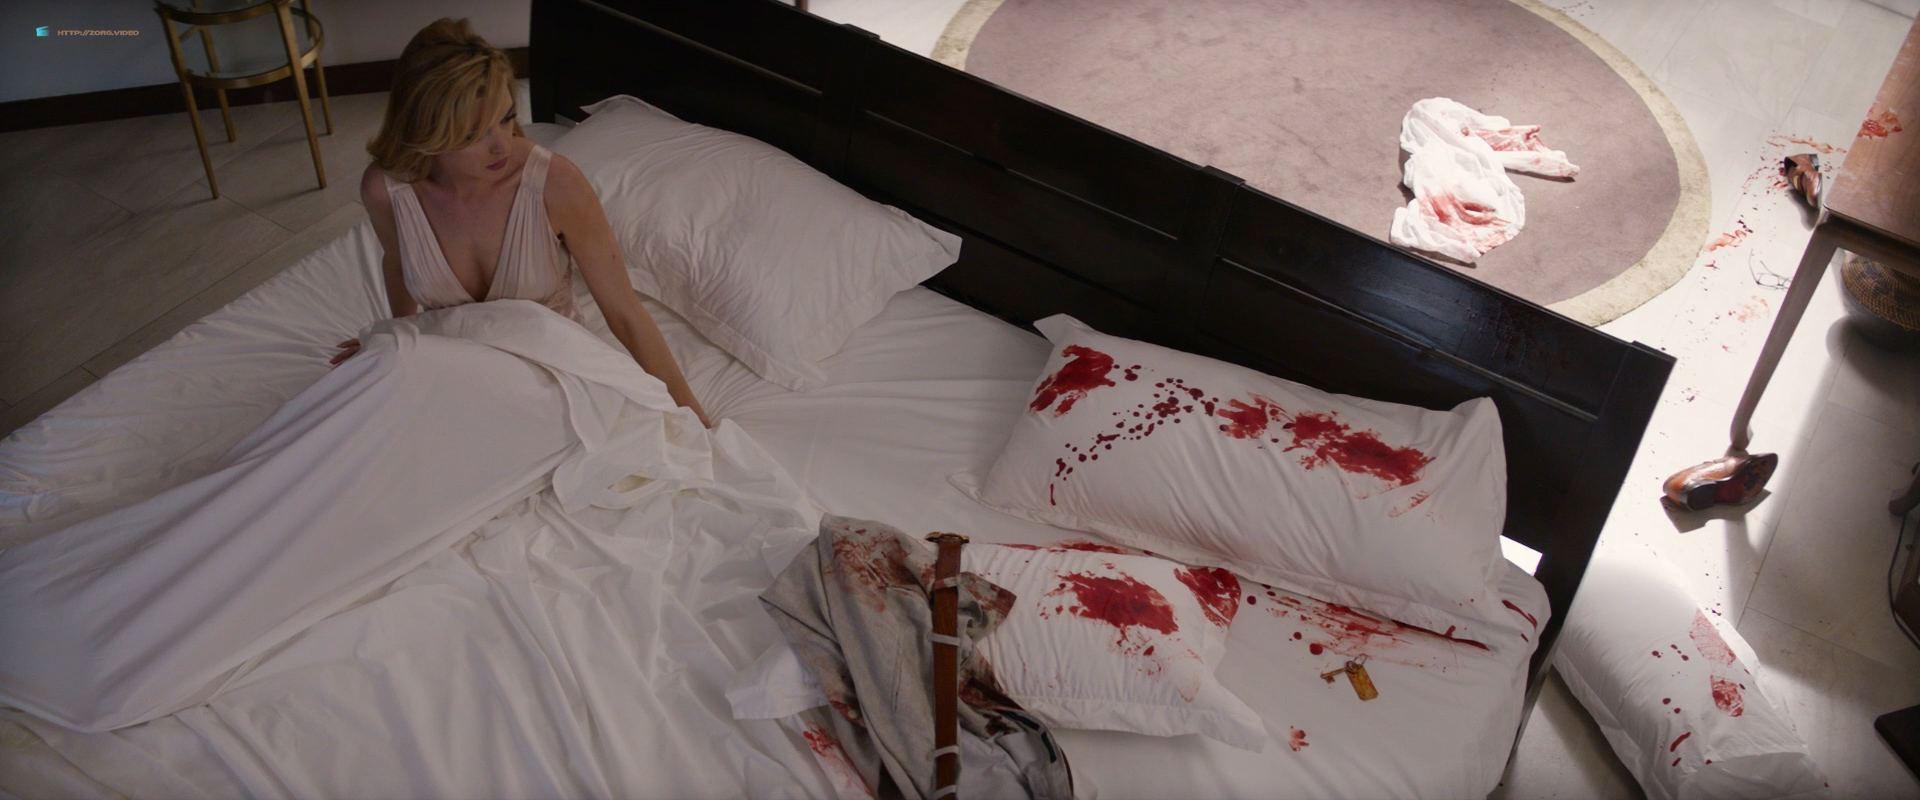 0201153347964_04_Anne-Hathaway-hot-in-sex-scene-Serenity-2019-HD-1080p-BluRay-00014.jpg